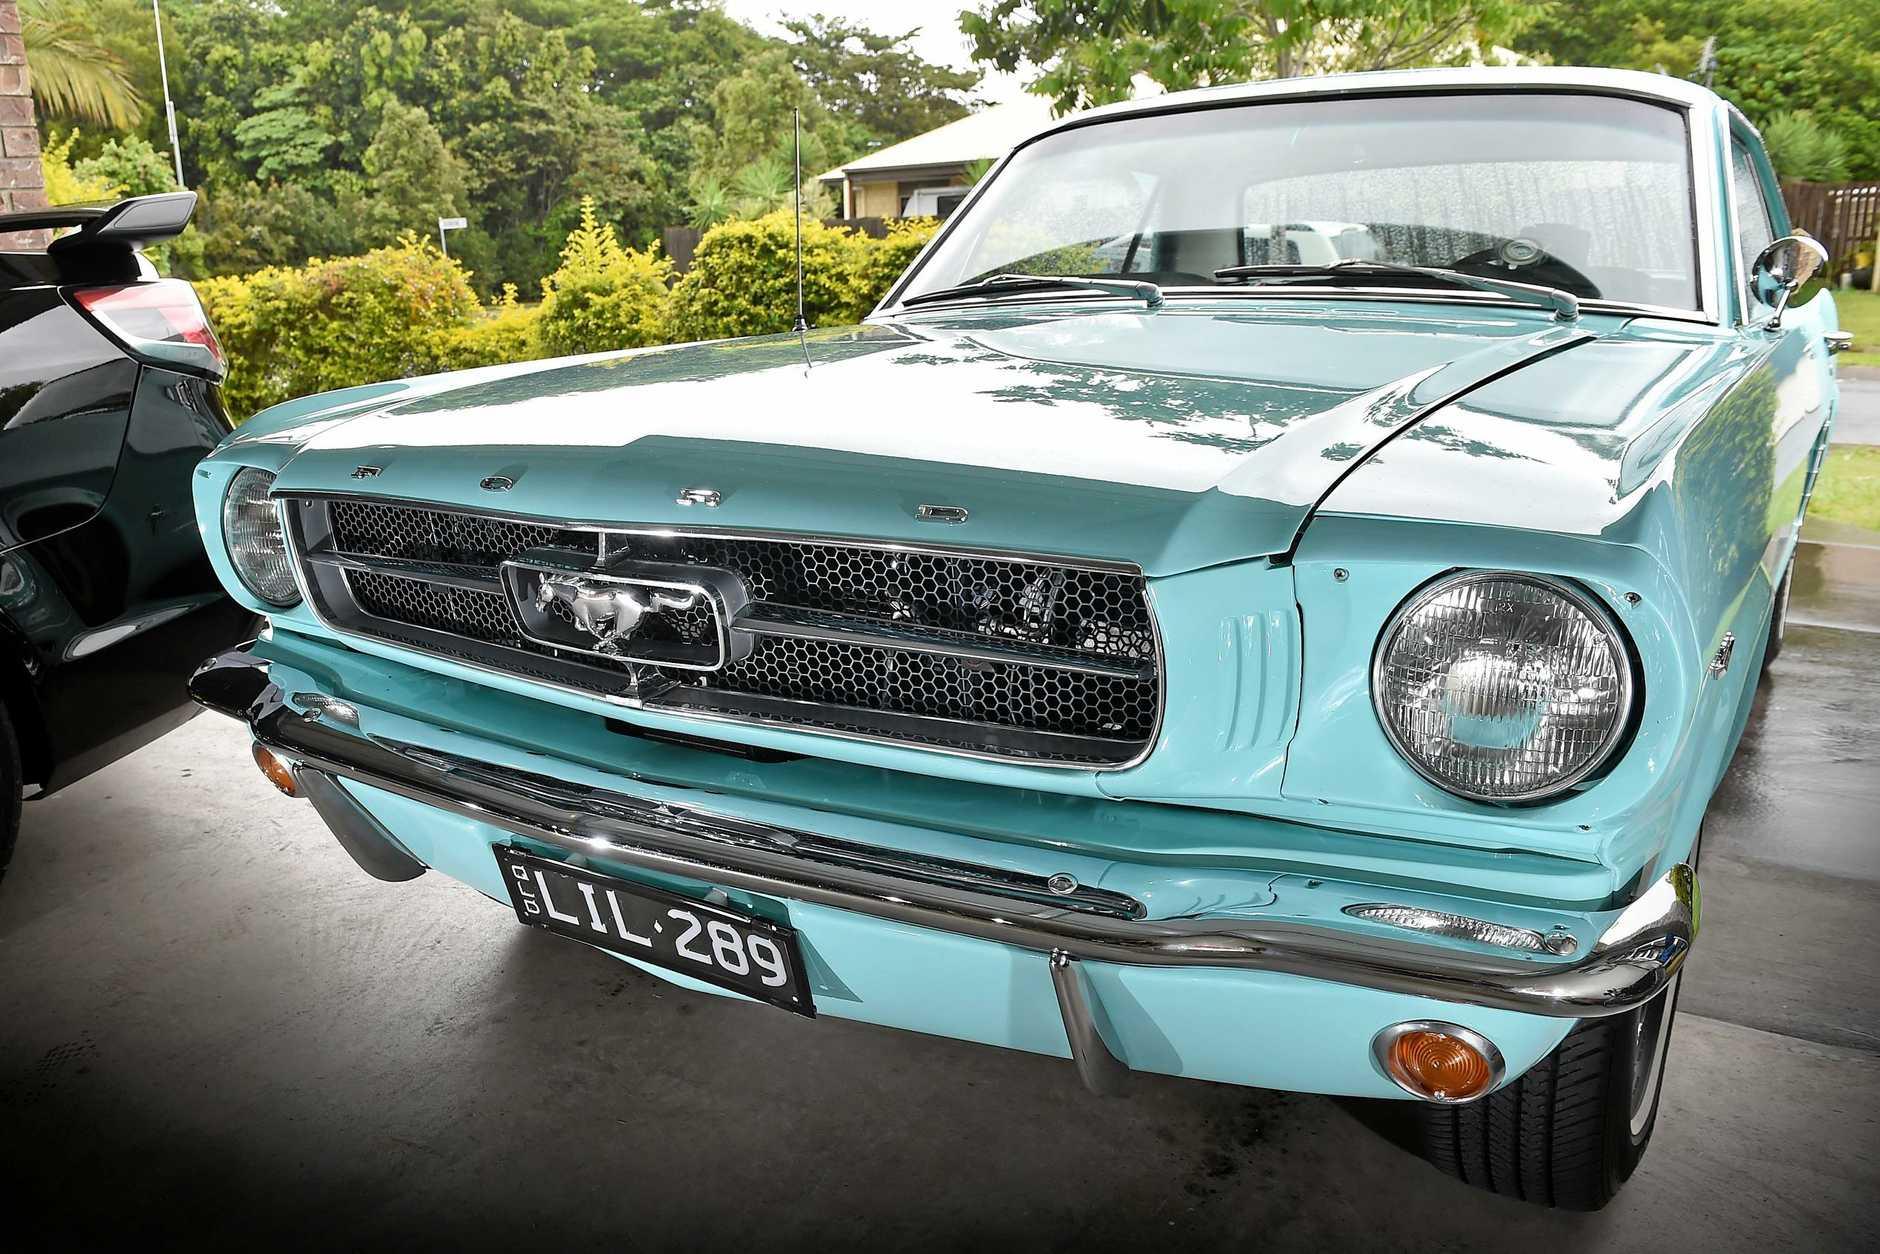 Lifelong Holden fan Caroline U'Pritchard shocked everyone by jumping ship to buy a 1965 Mustang last year.